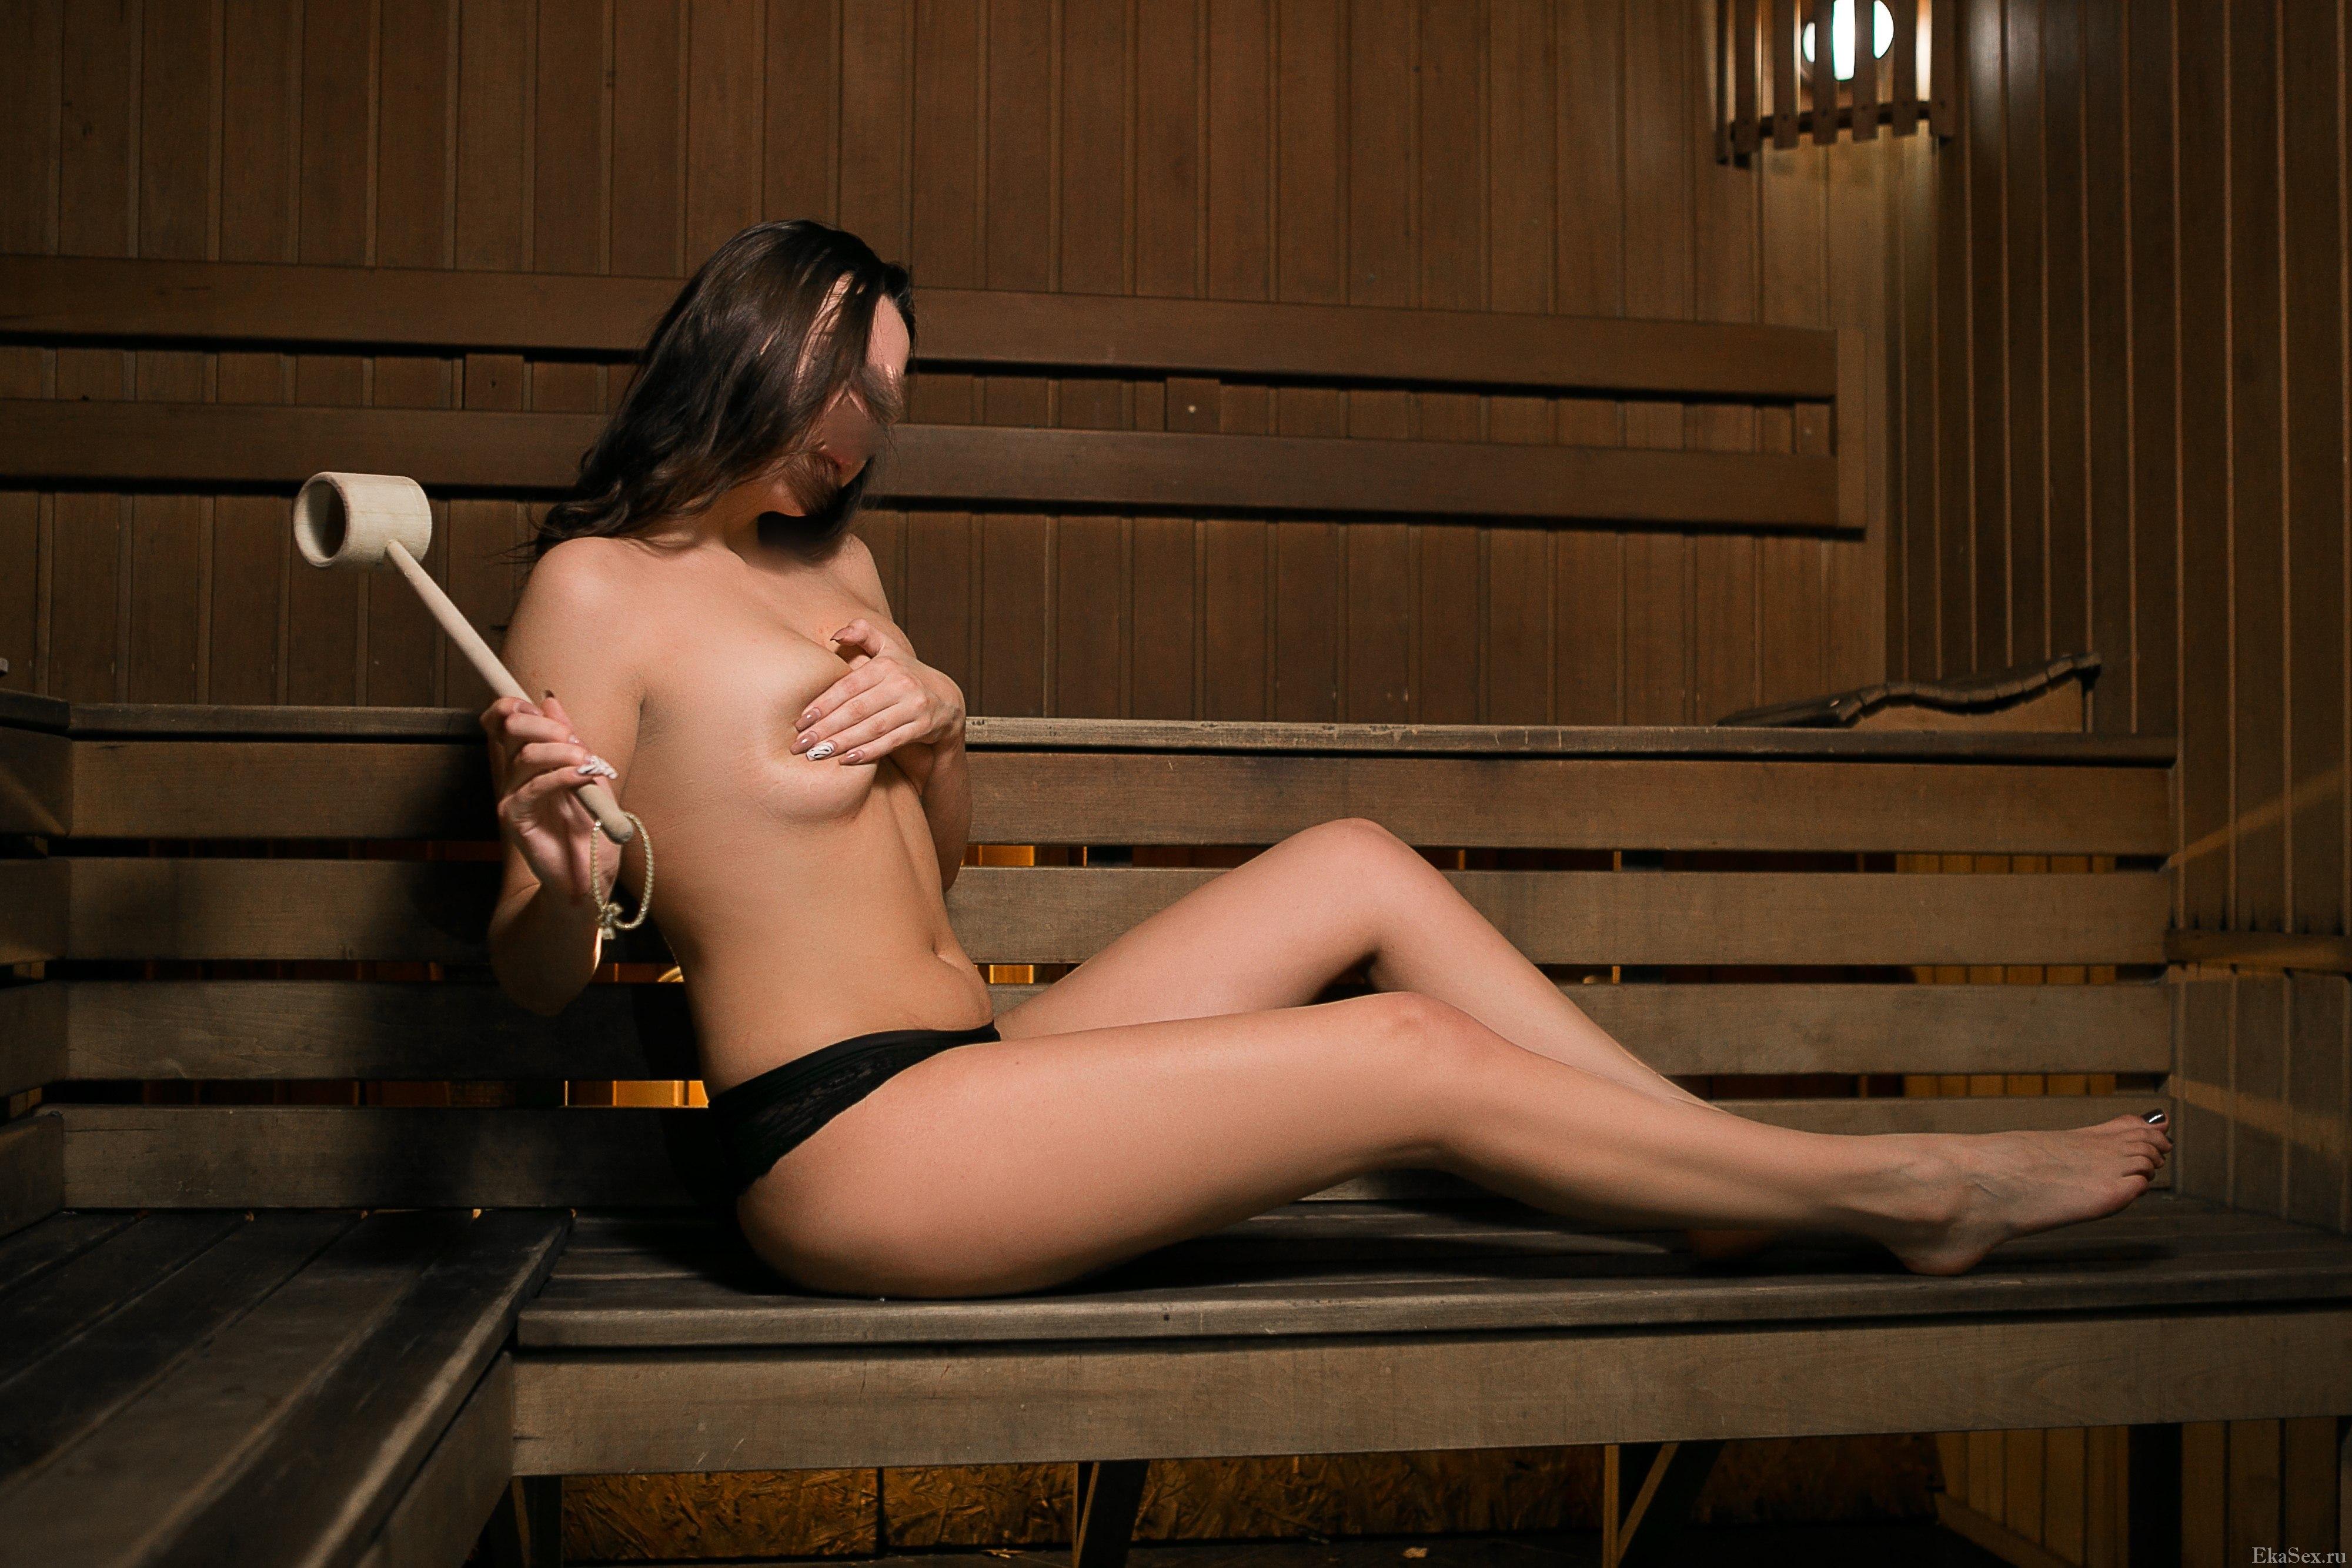 фото проститутки Моника из города Екатеринбург